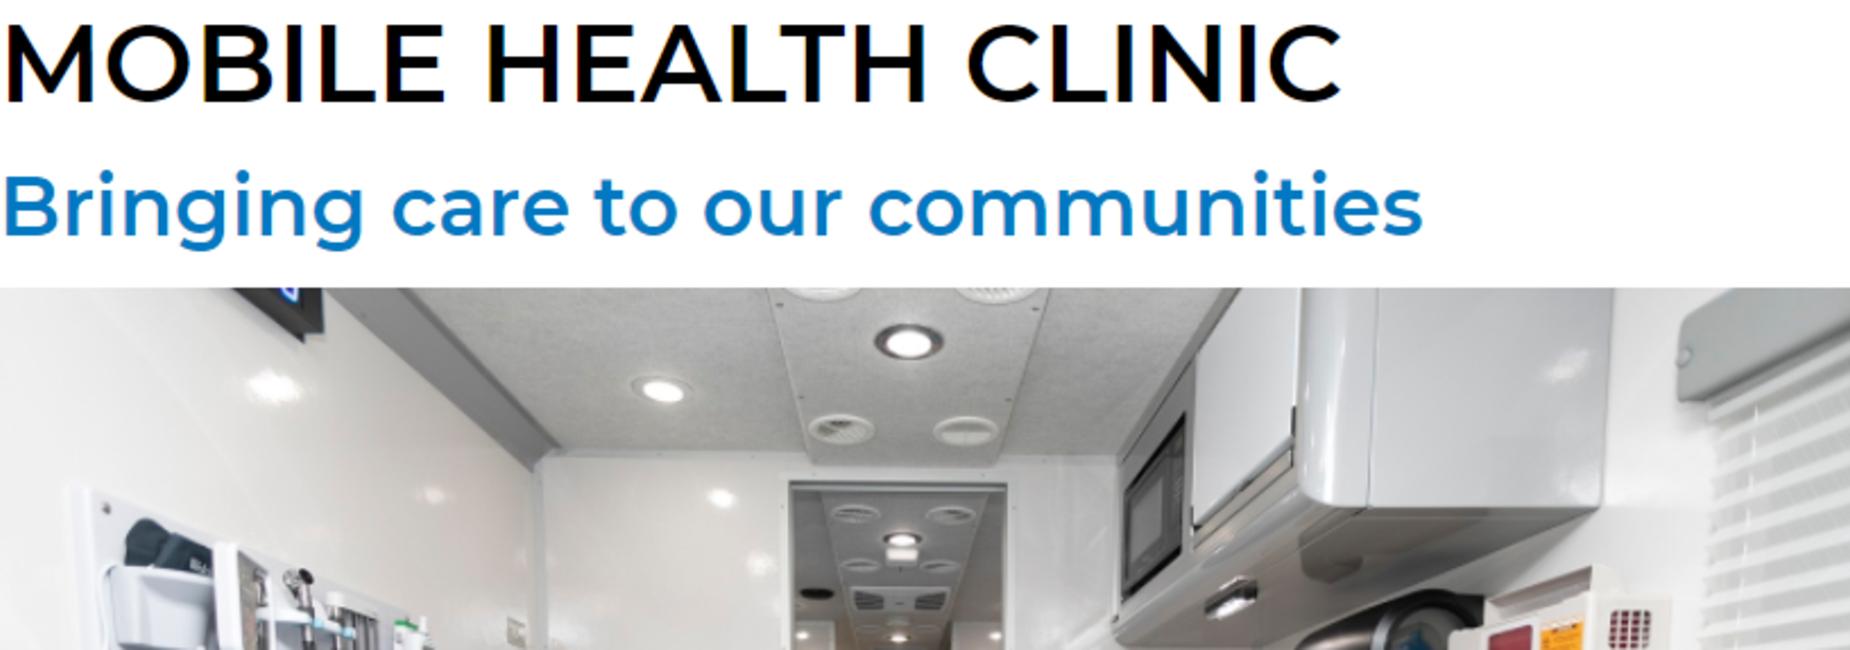 The Salinas Valley Memorial Mobile Health Clinic